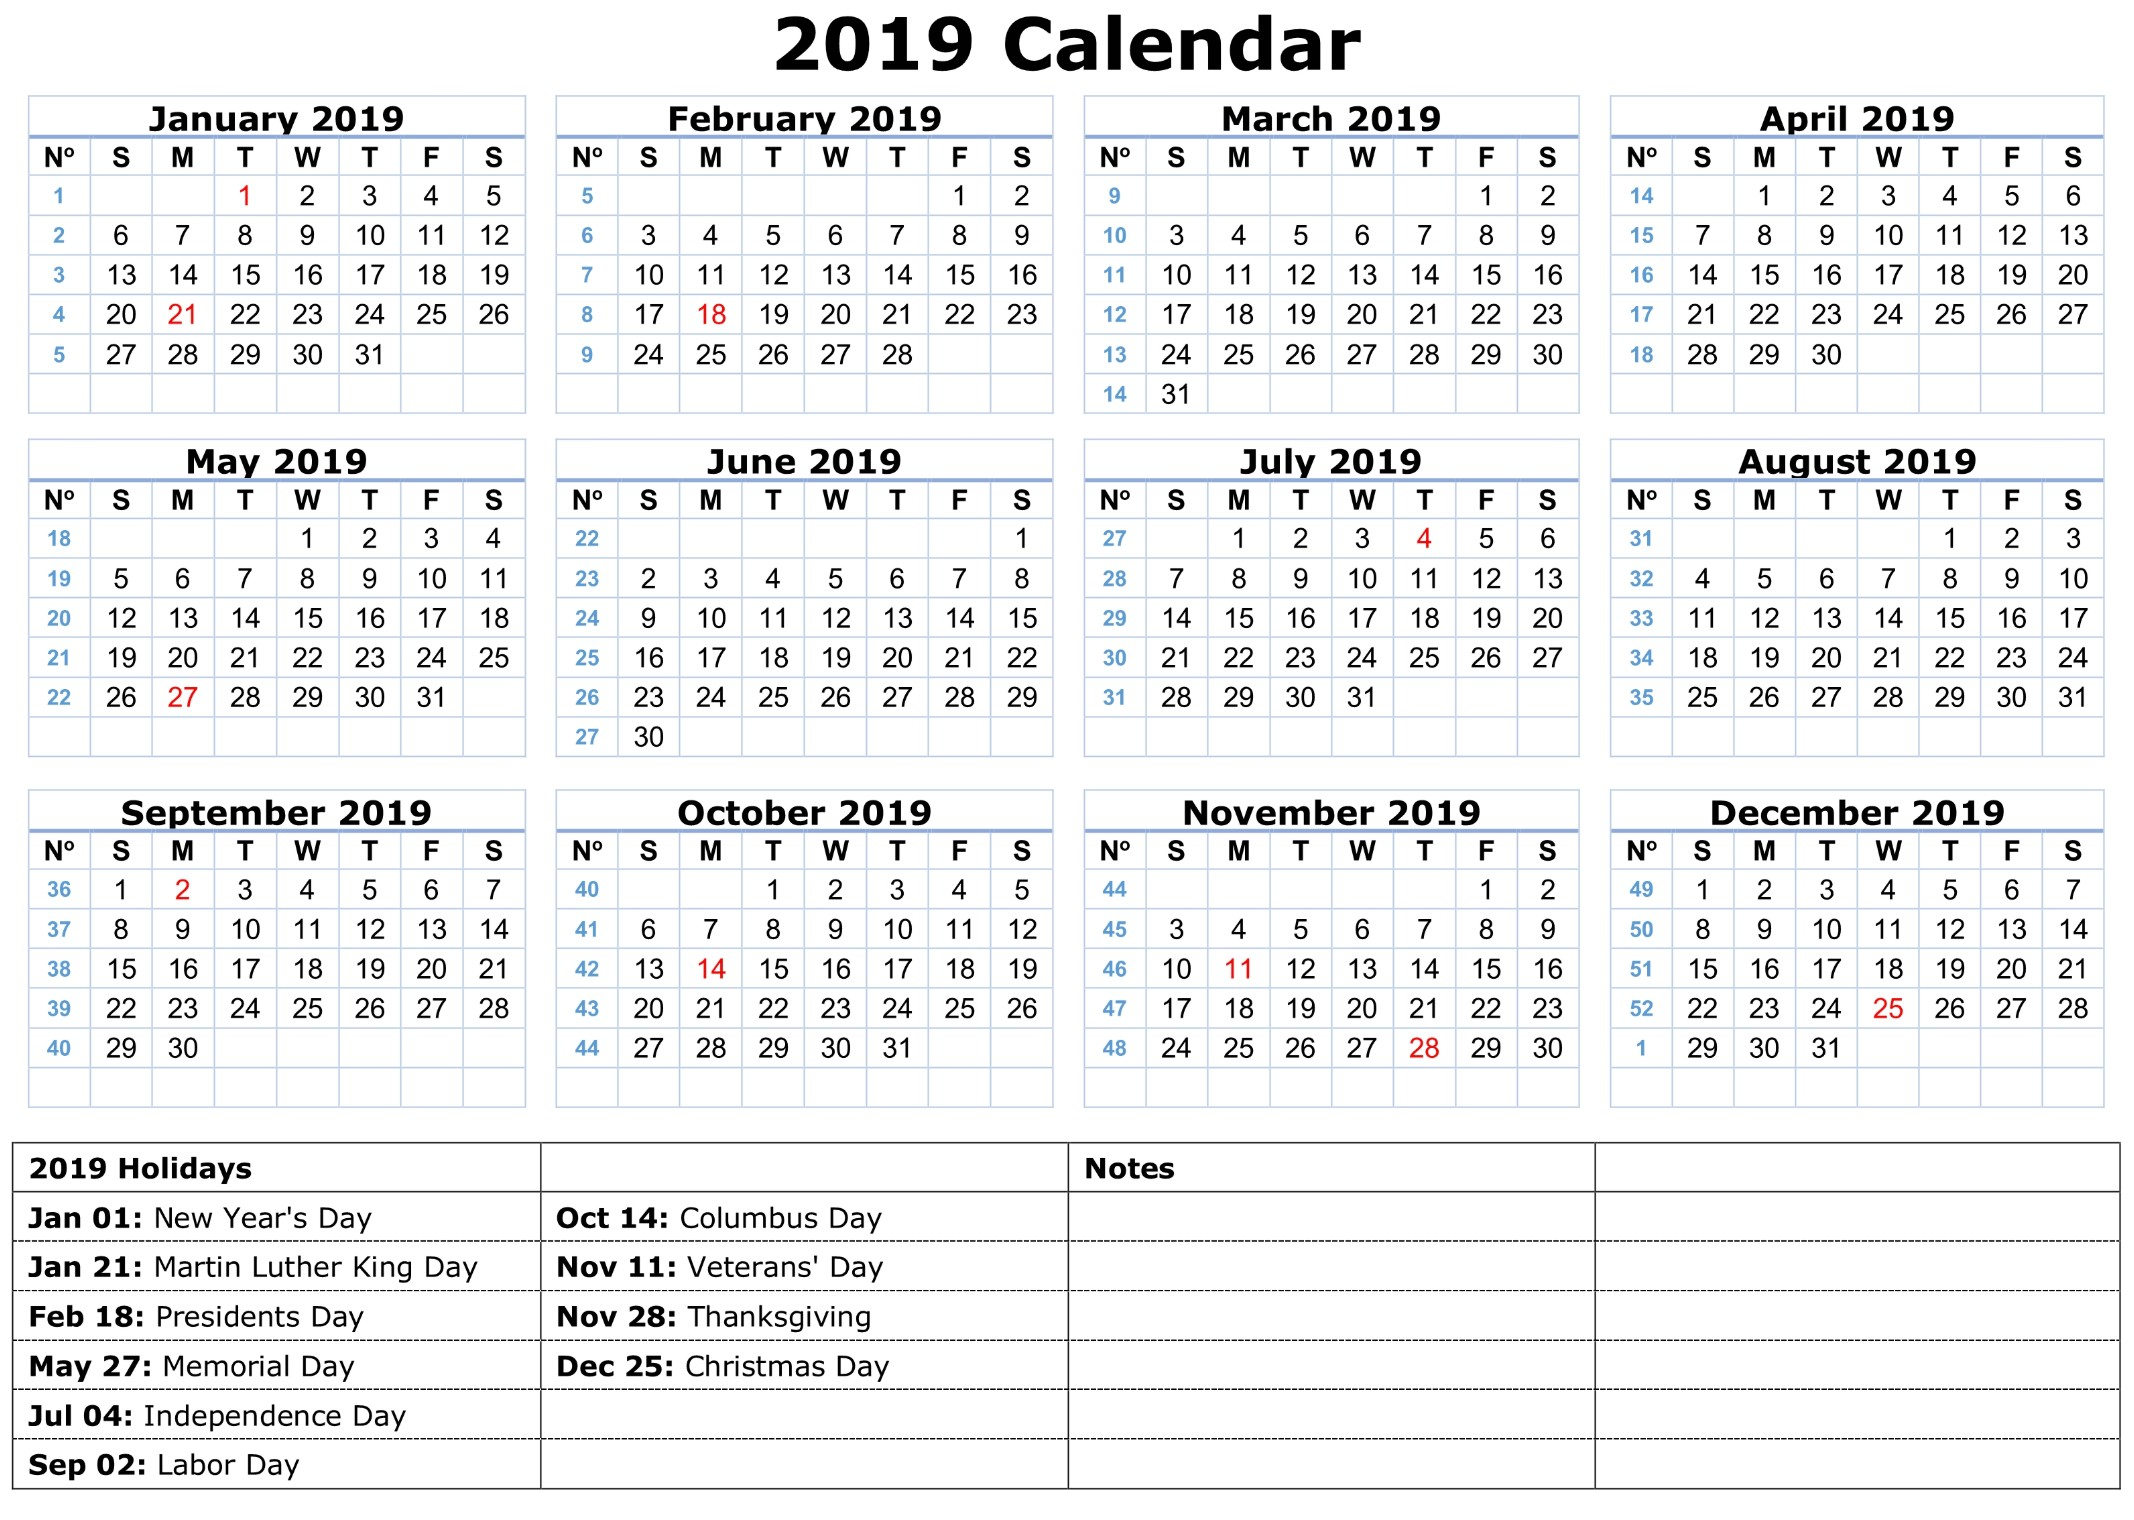 2019 Free Calendar Printable 2019 Calendar Amazonaws